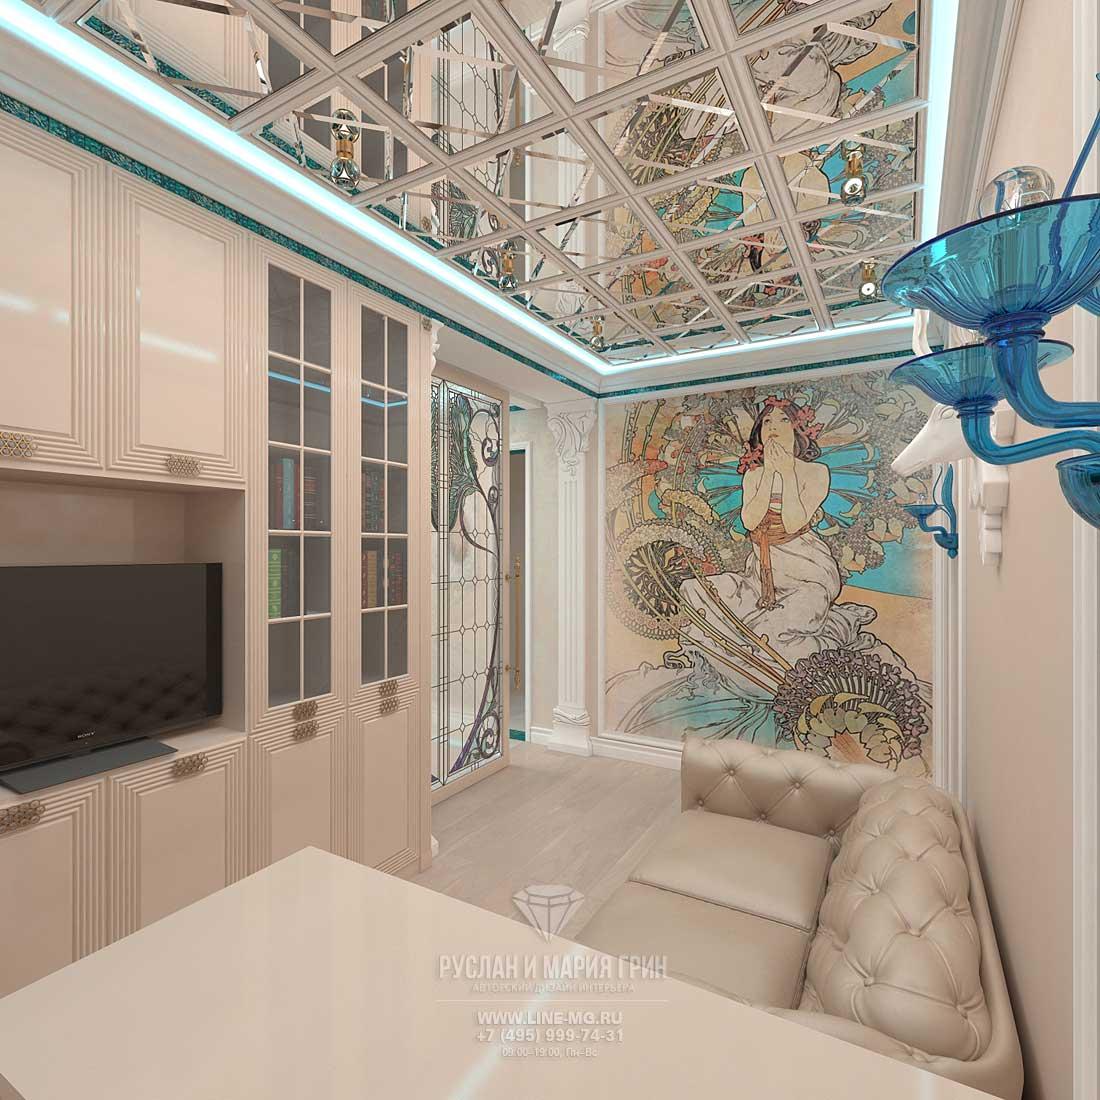 Дизайн интерьера кабинета: фото